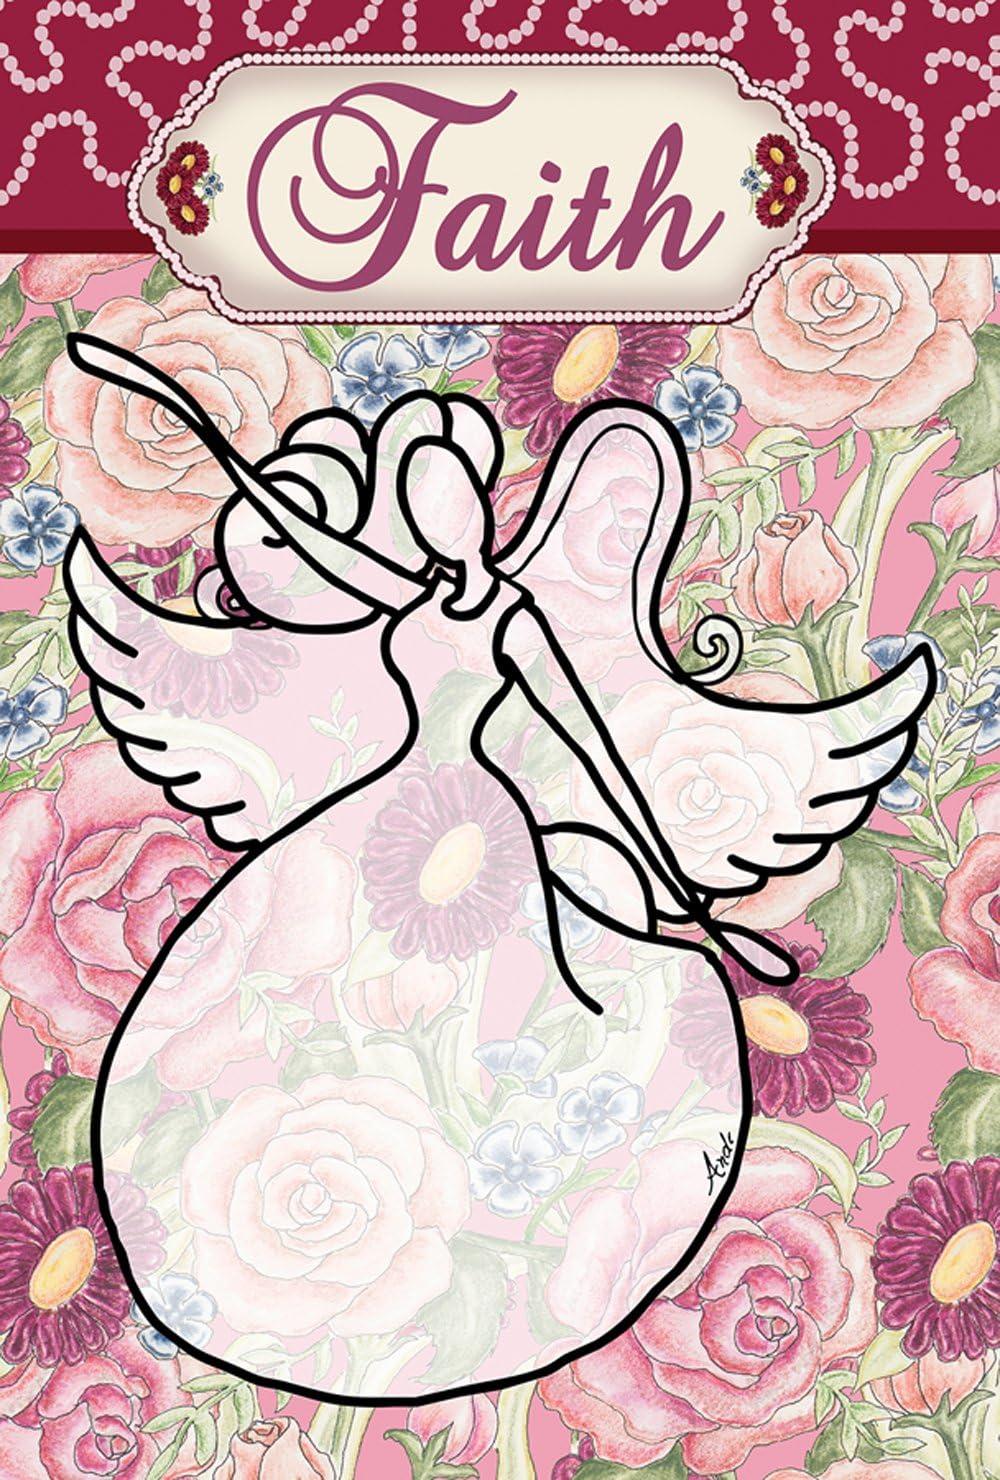 Toland Home Garden 119868 Faith Angel 12.5 x 18 Inch Decorative, Garden Flag (12.5